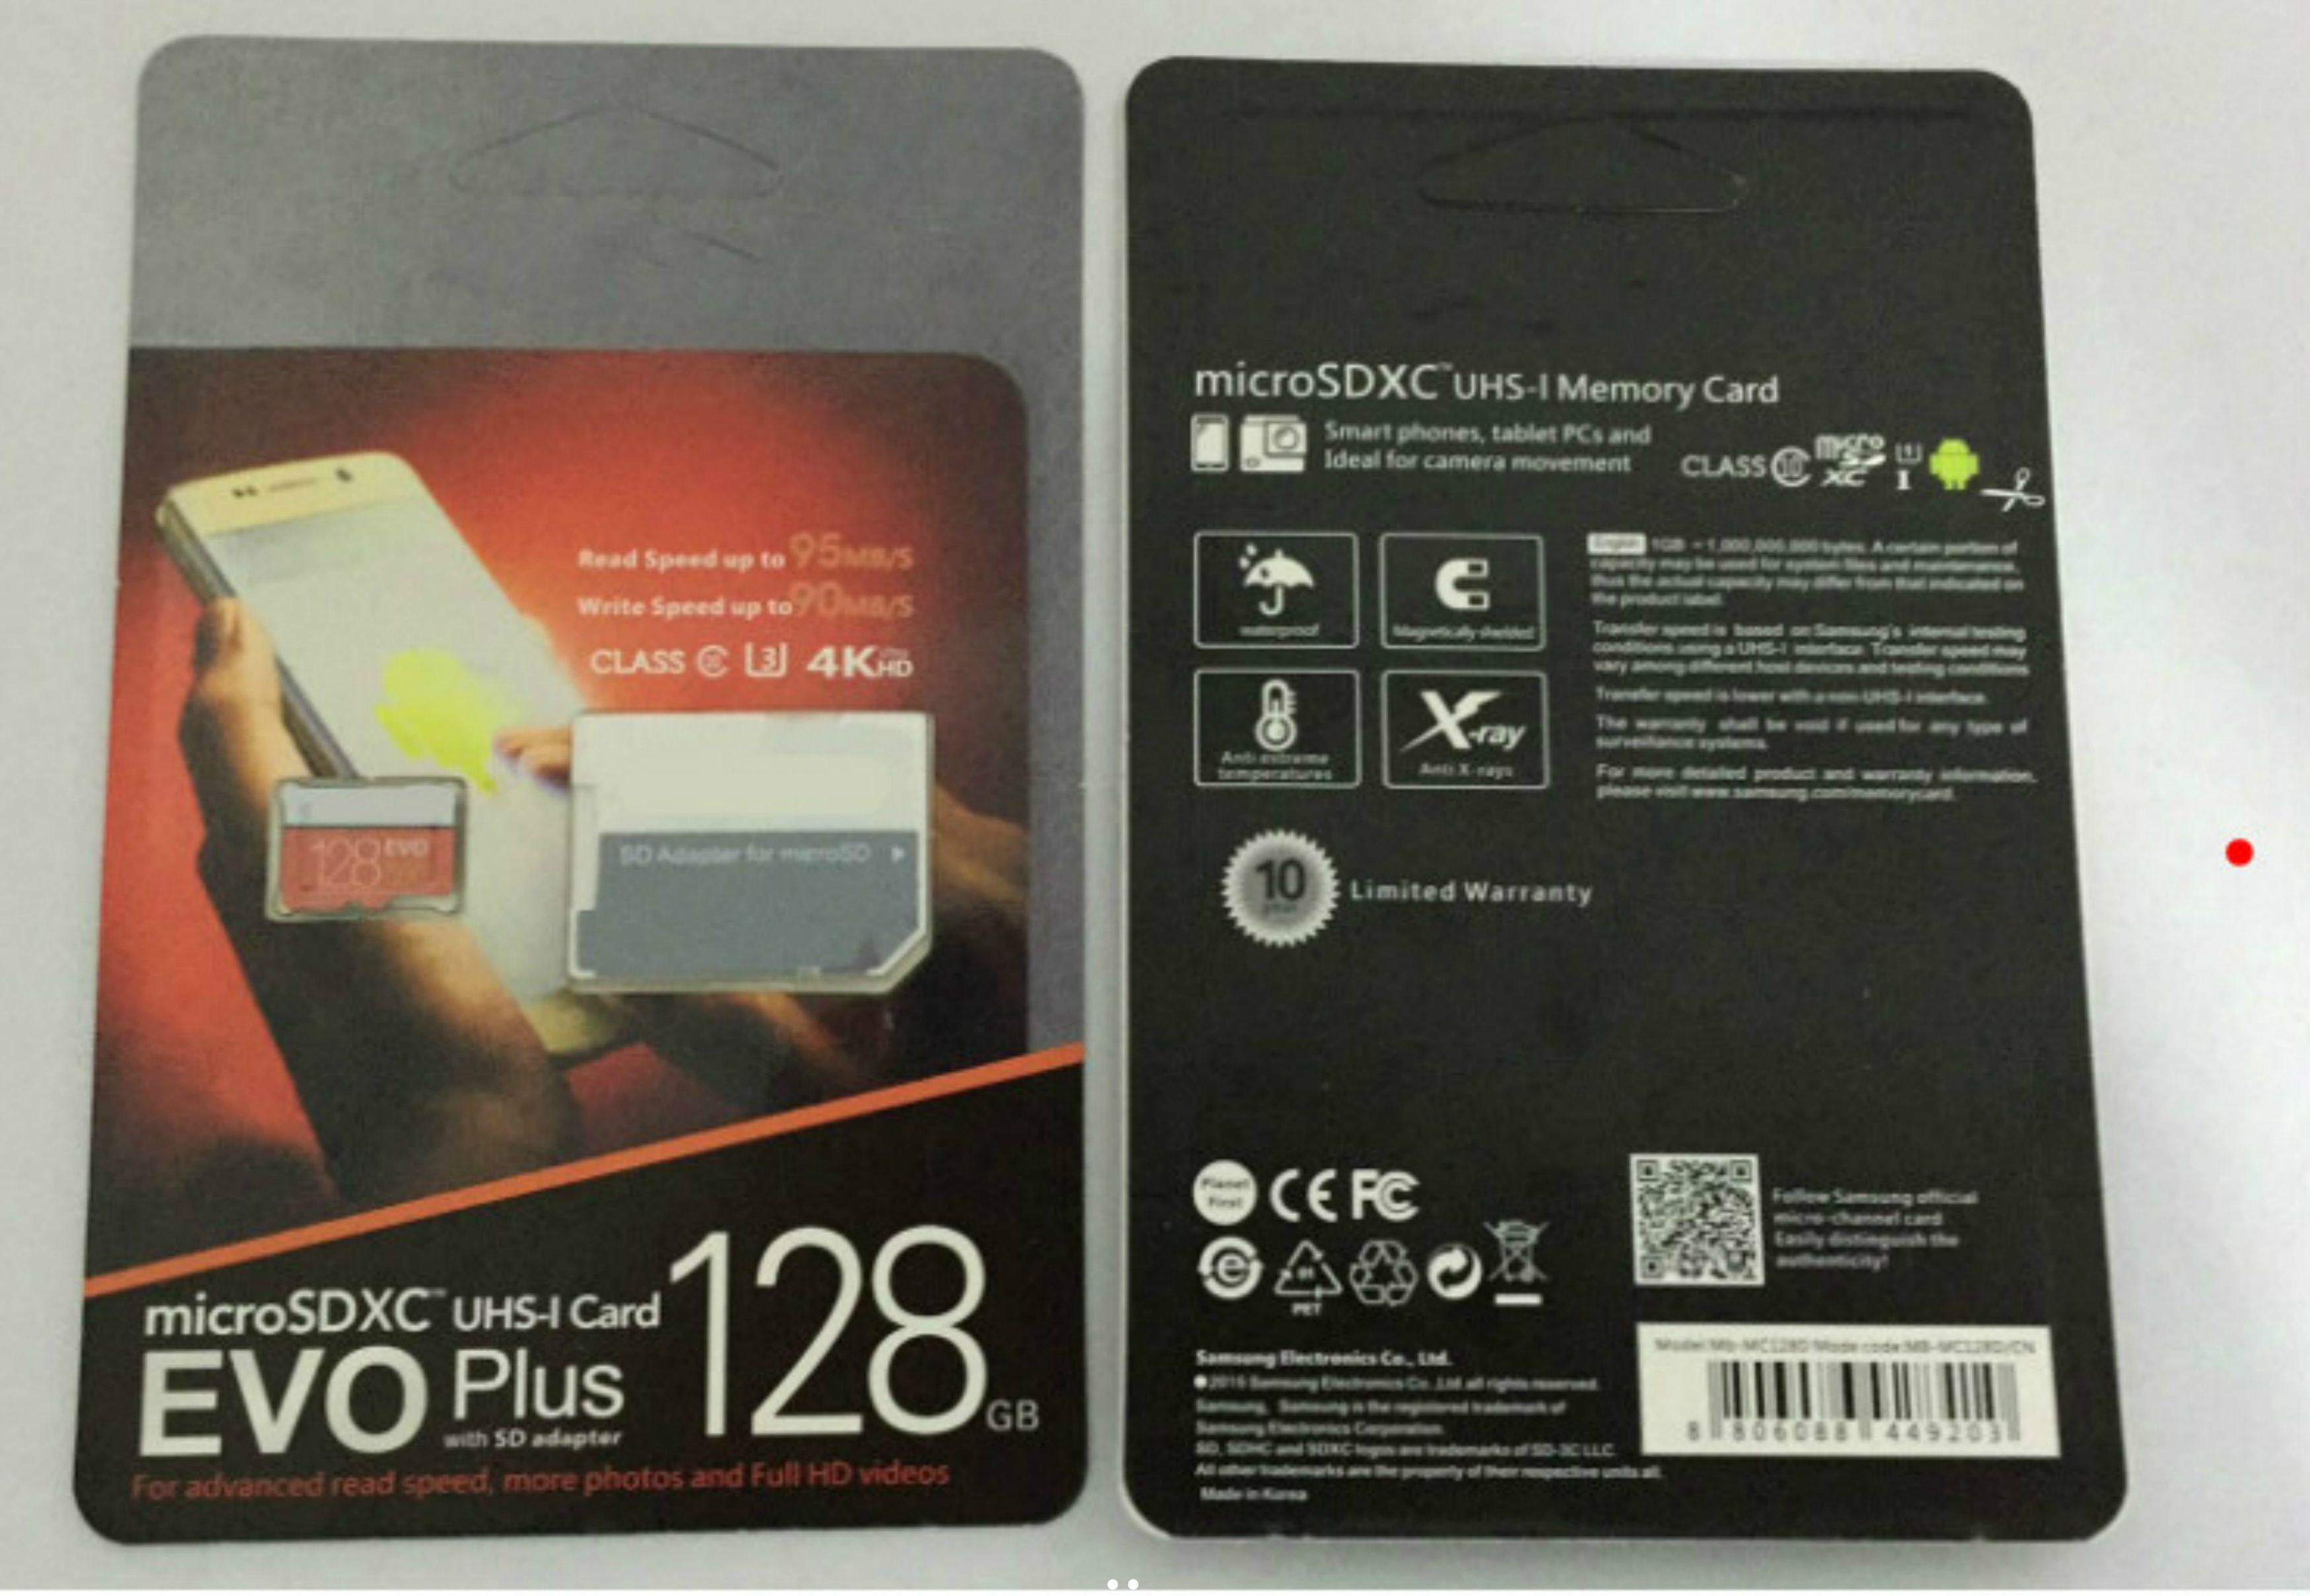 16G / 32GB / 64GB / 128GB / 256GB EVO + 플러스 마이크로 SD 카드 U3 / 스마트 폰 TF 카드 C10 / 자동차 레코더 SDXC 저장 카드 95MB / s